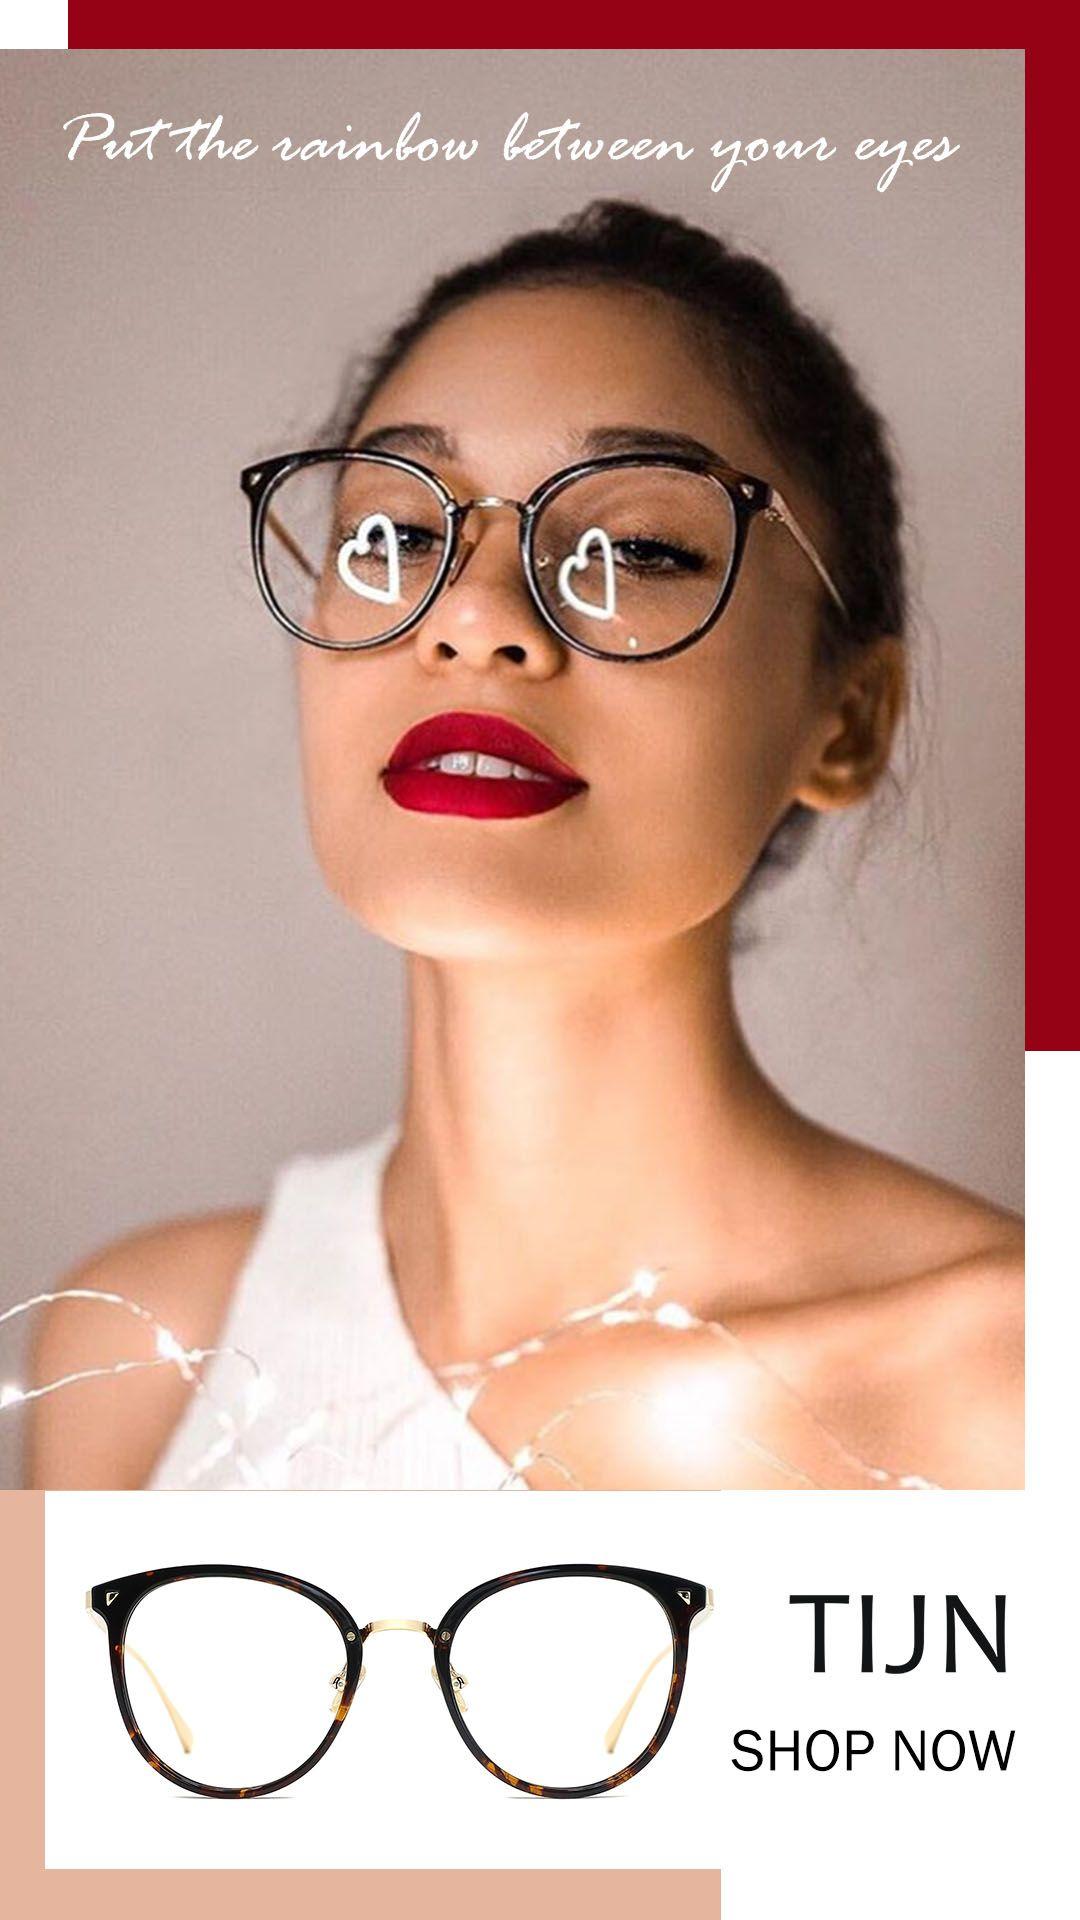 Eyewear Trends Women NEW Fashion. You may get a new look.Top sale glasses.   eyewear  fashion eyewear  sunglasses eye 9269c55e2